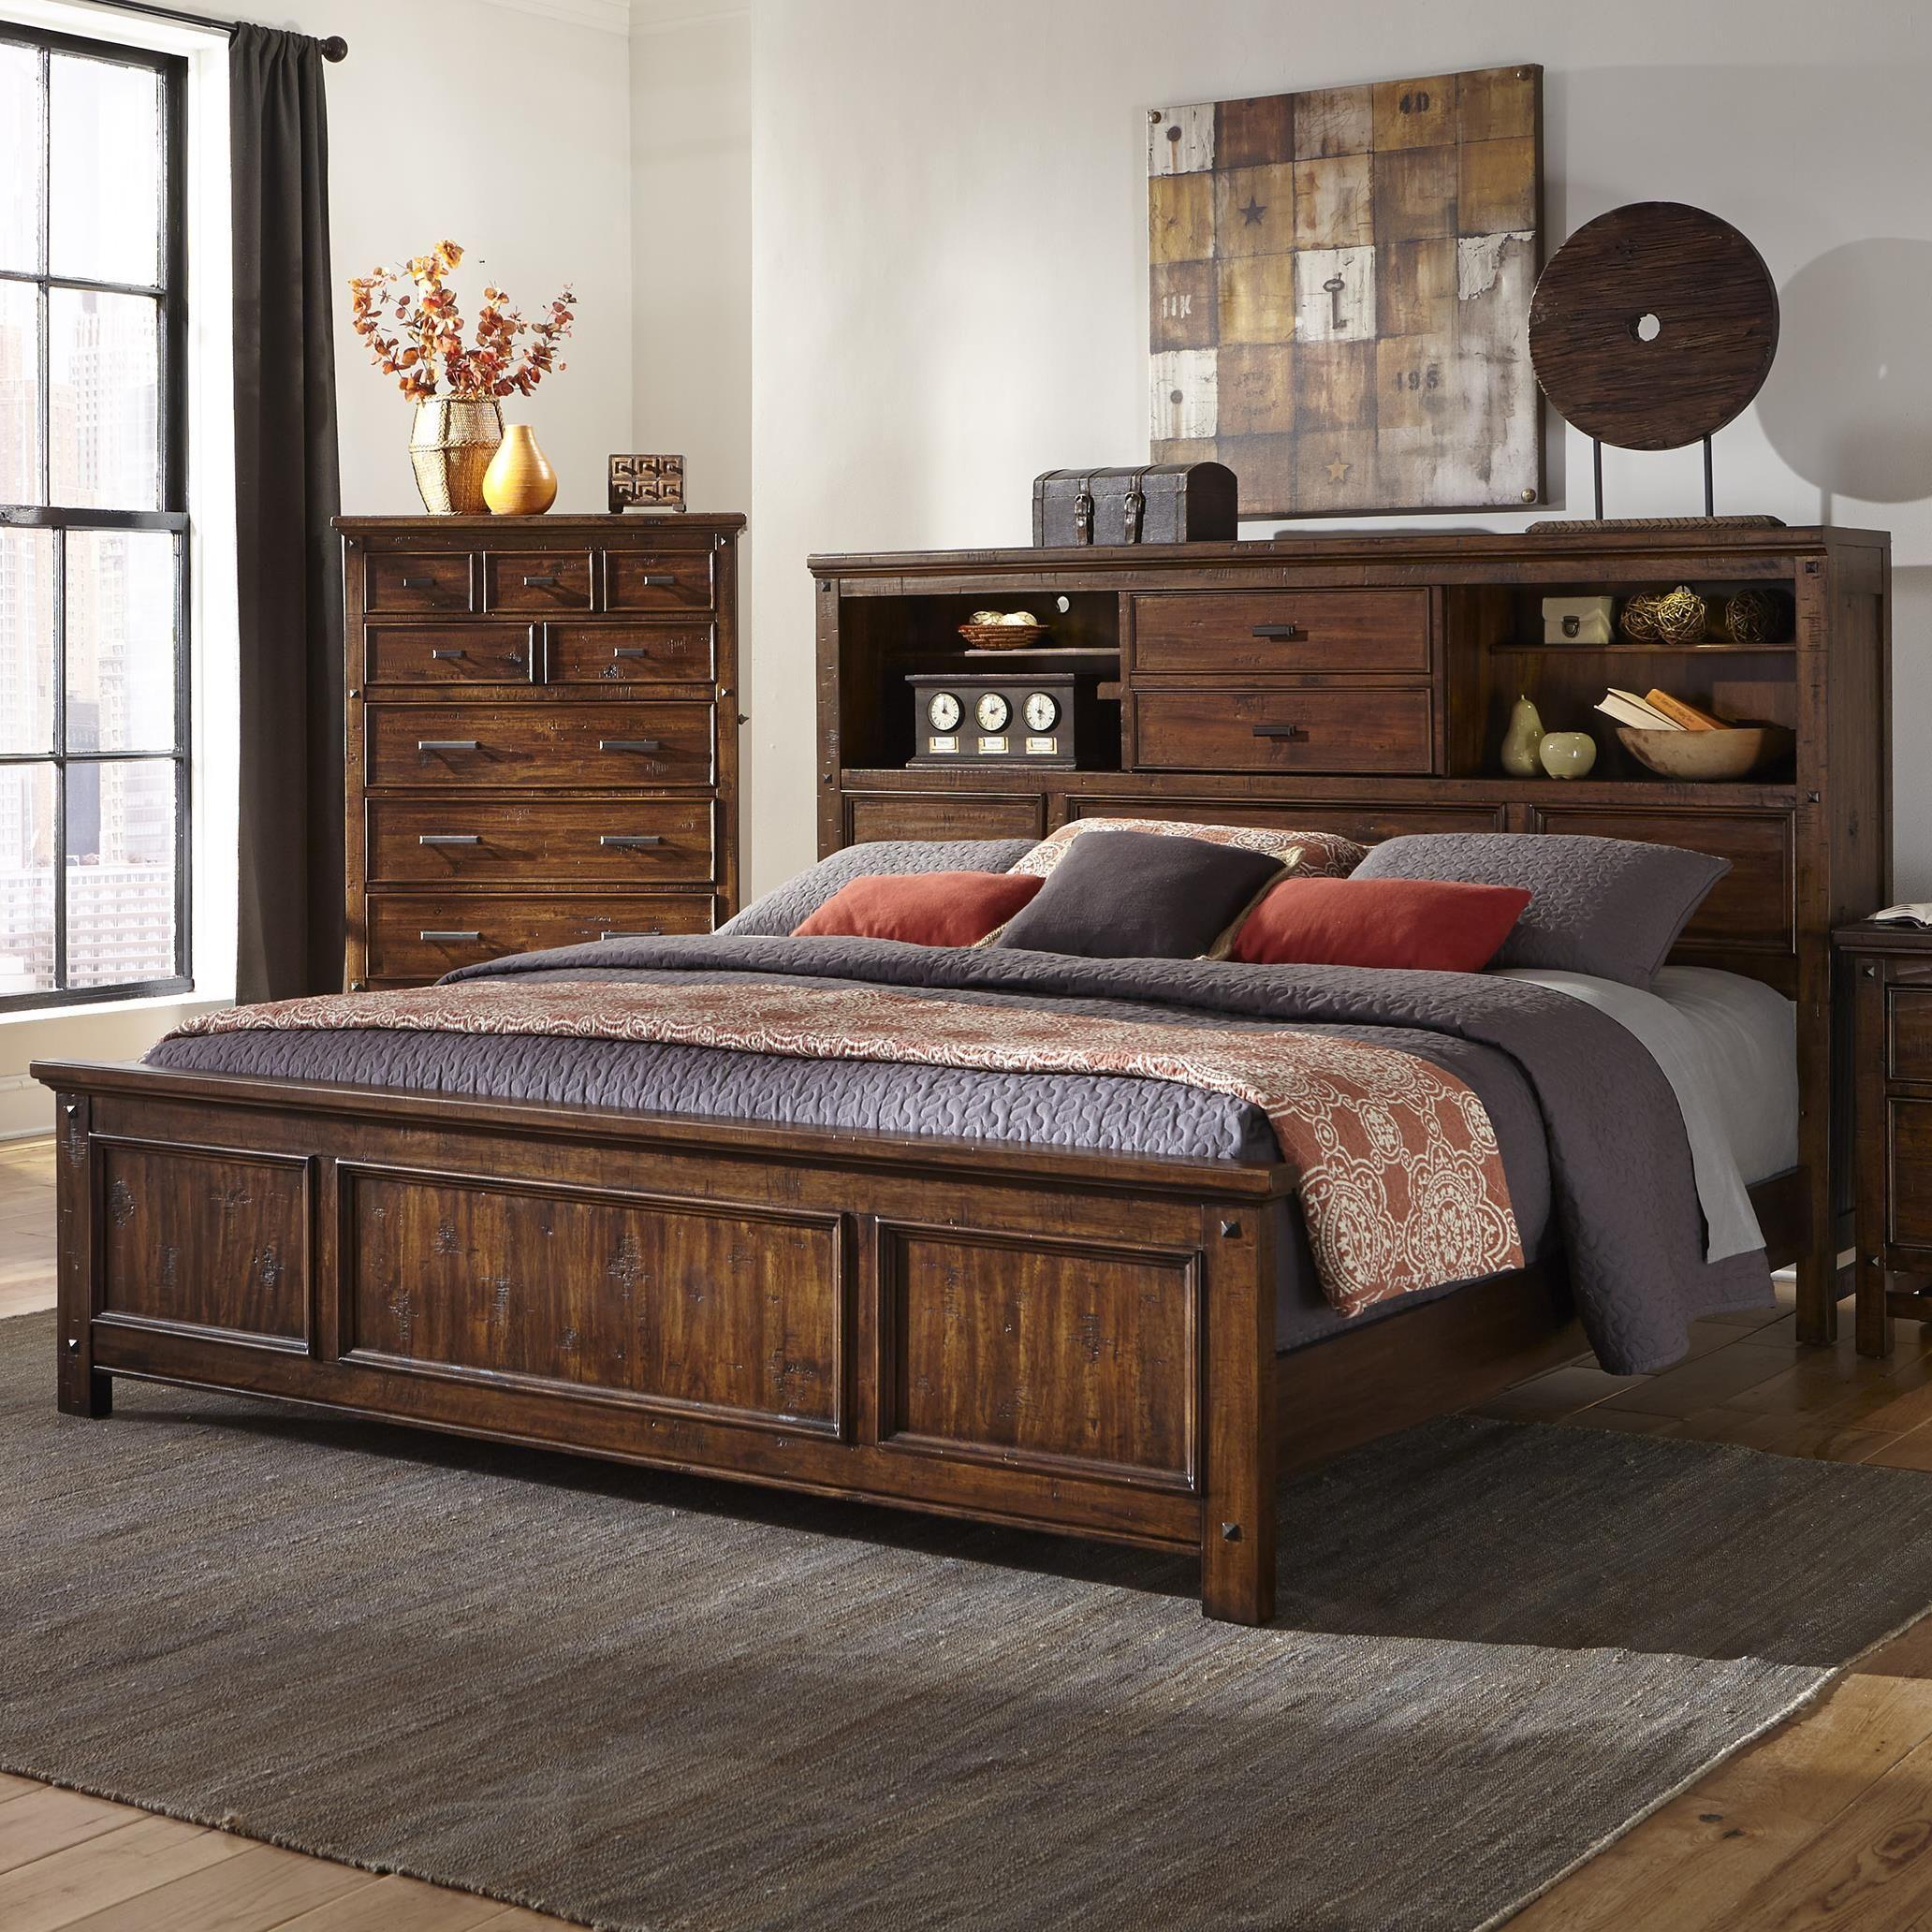 Wolf Creek Queen Bookcase Bed by Intercon Rustic bedroom